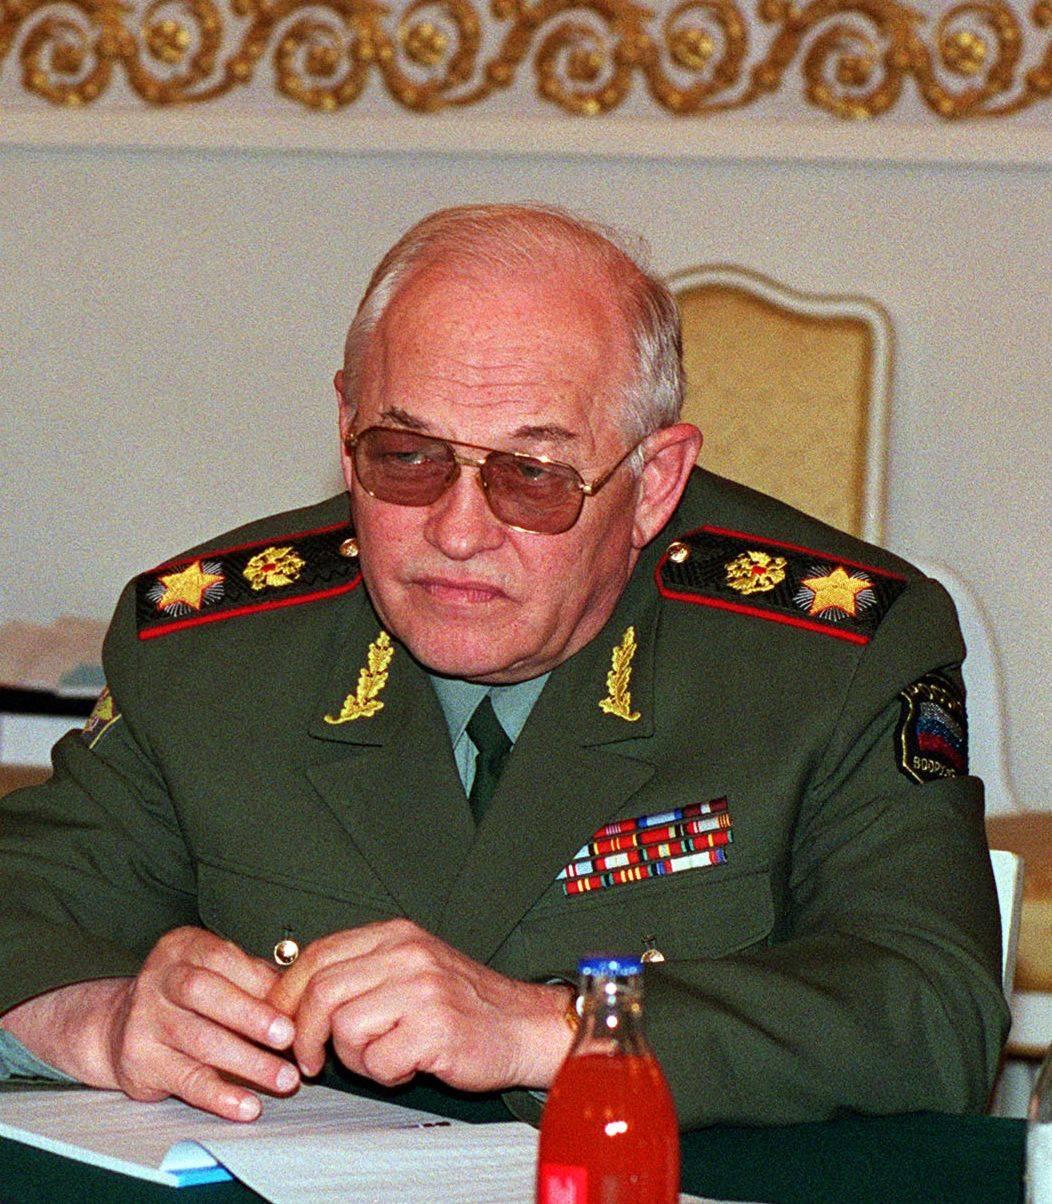 мерецков кирилл афанасьевич